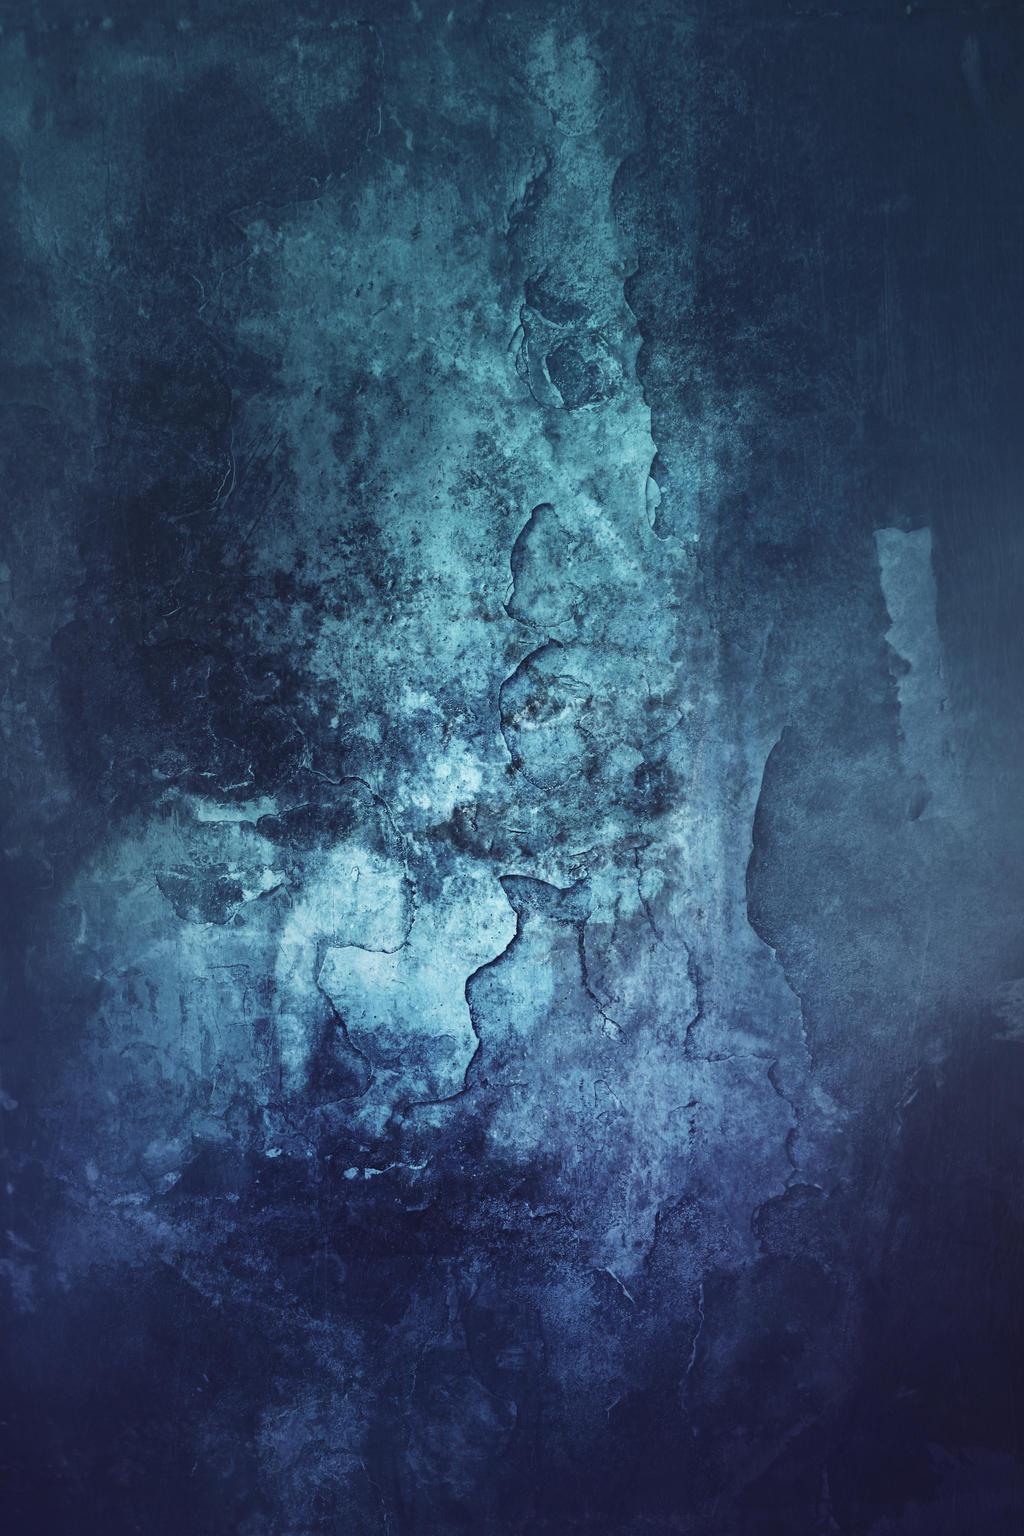 Digital Texture Artwork 332